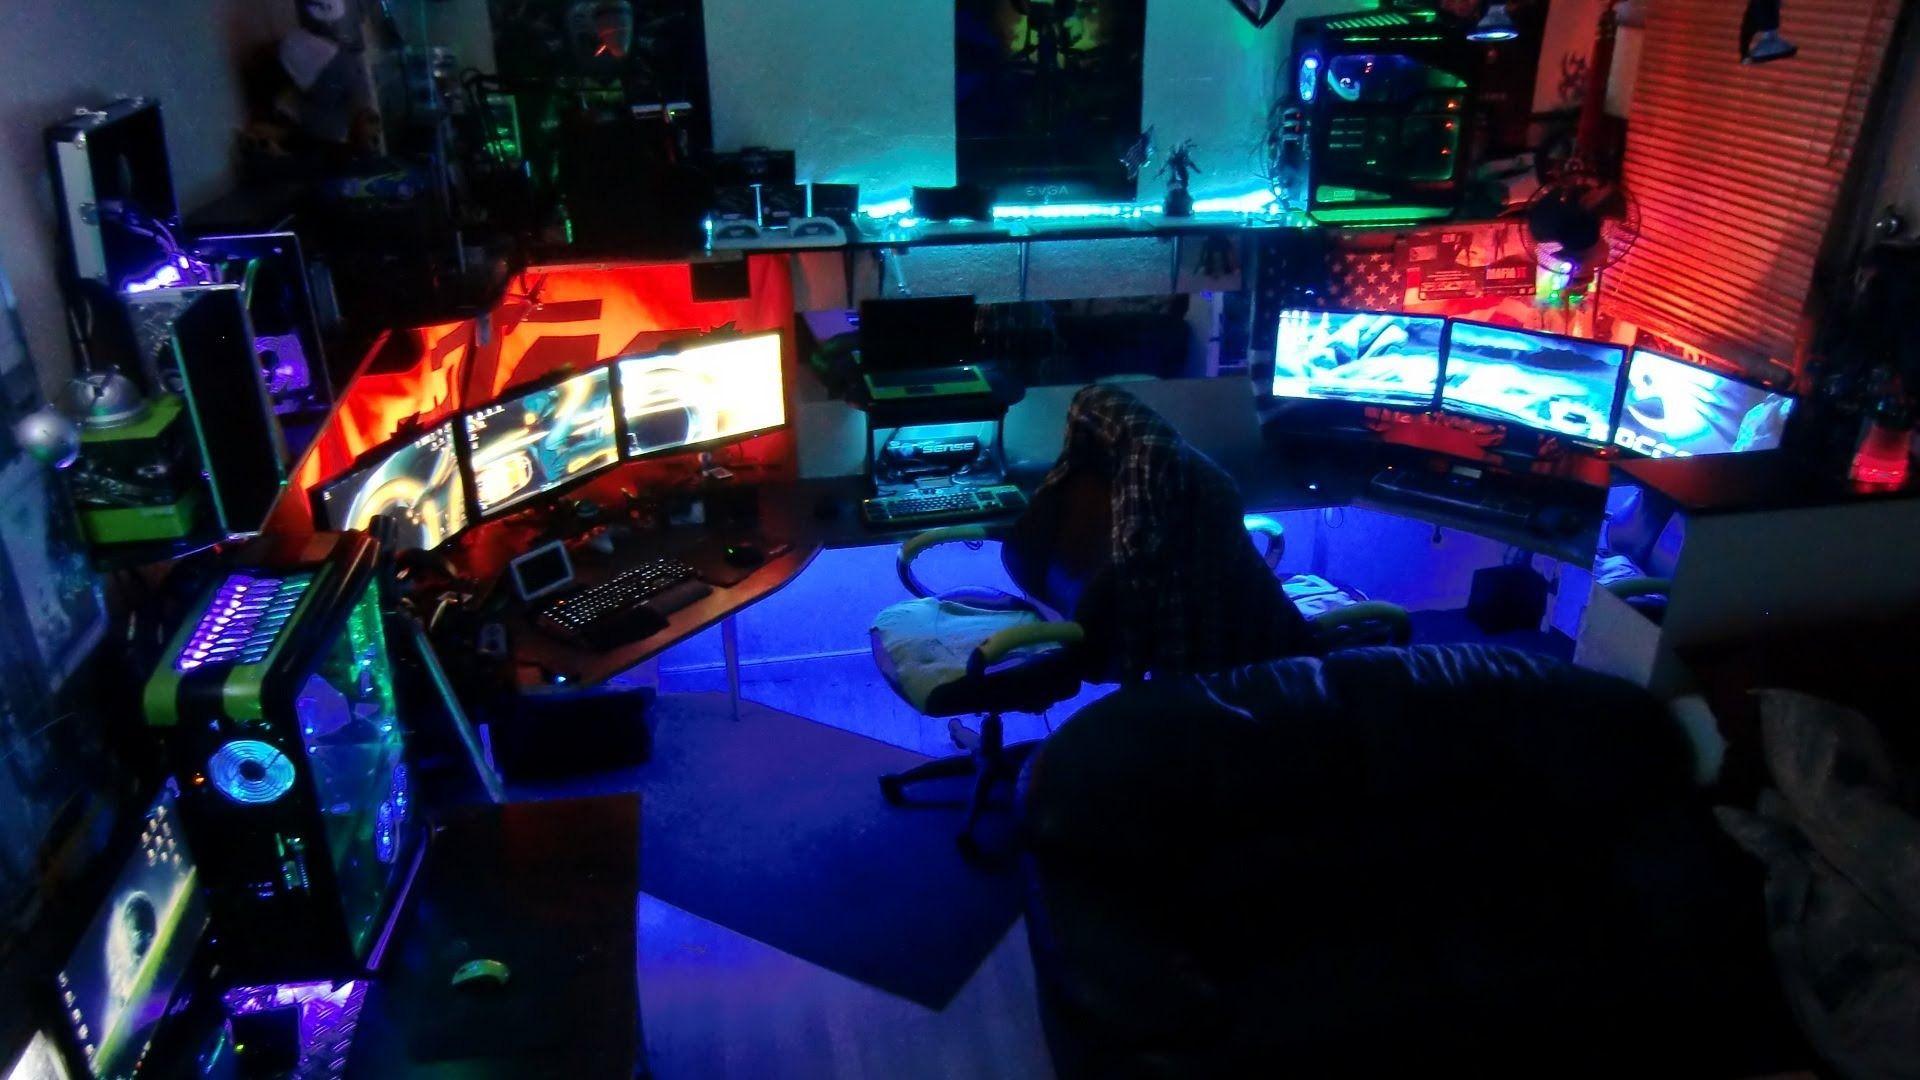 Dopest Pc Gamer Set Up Workstation Holy Shit You